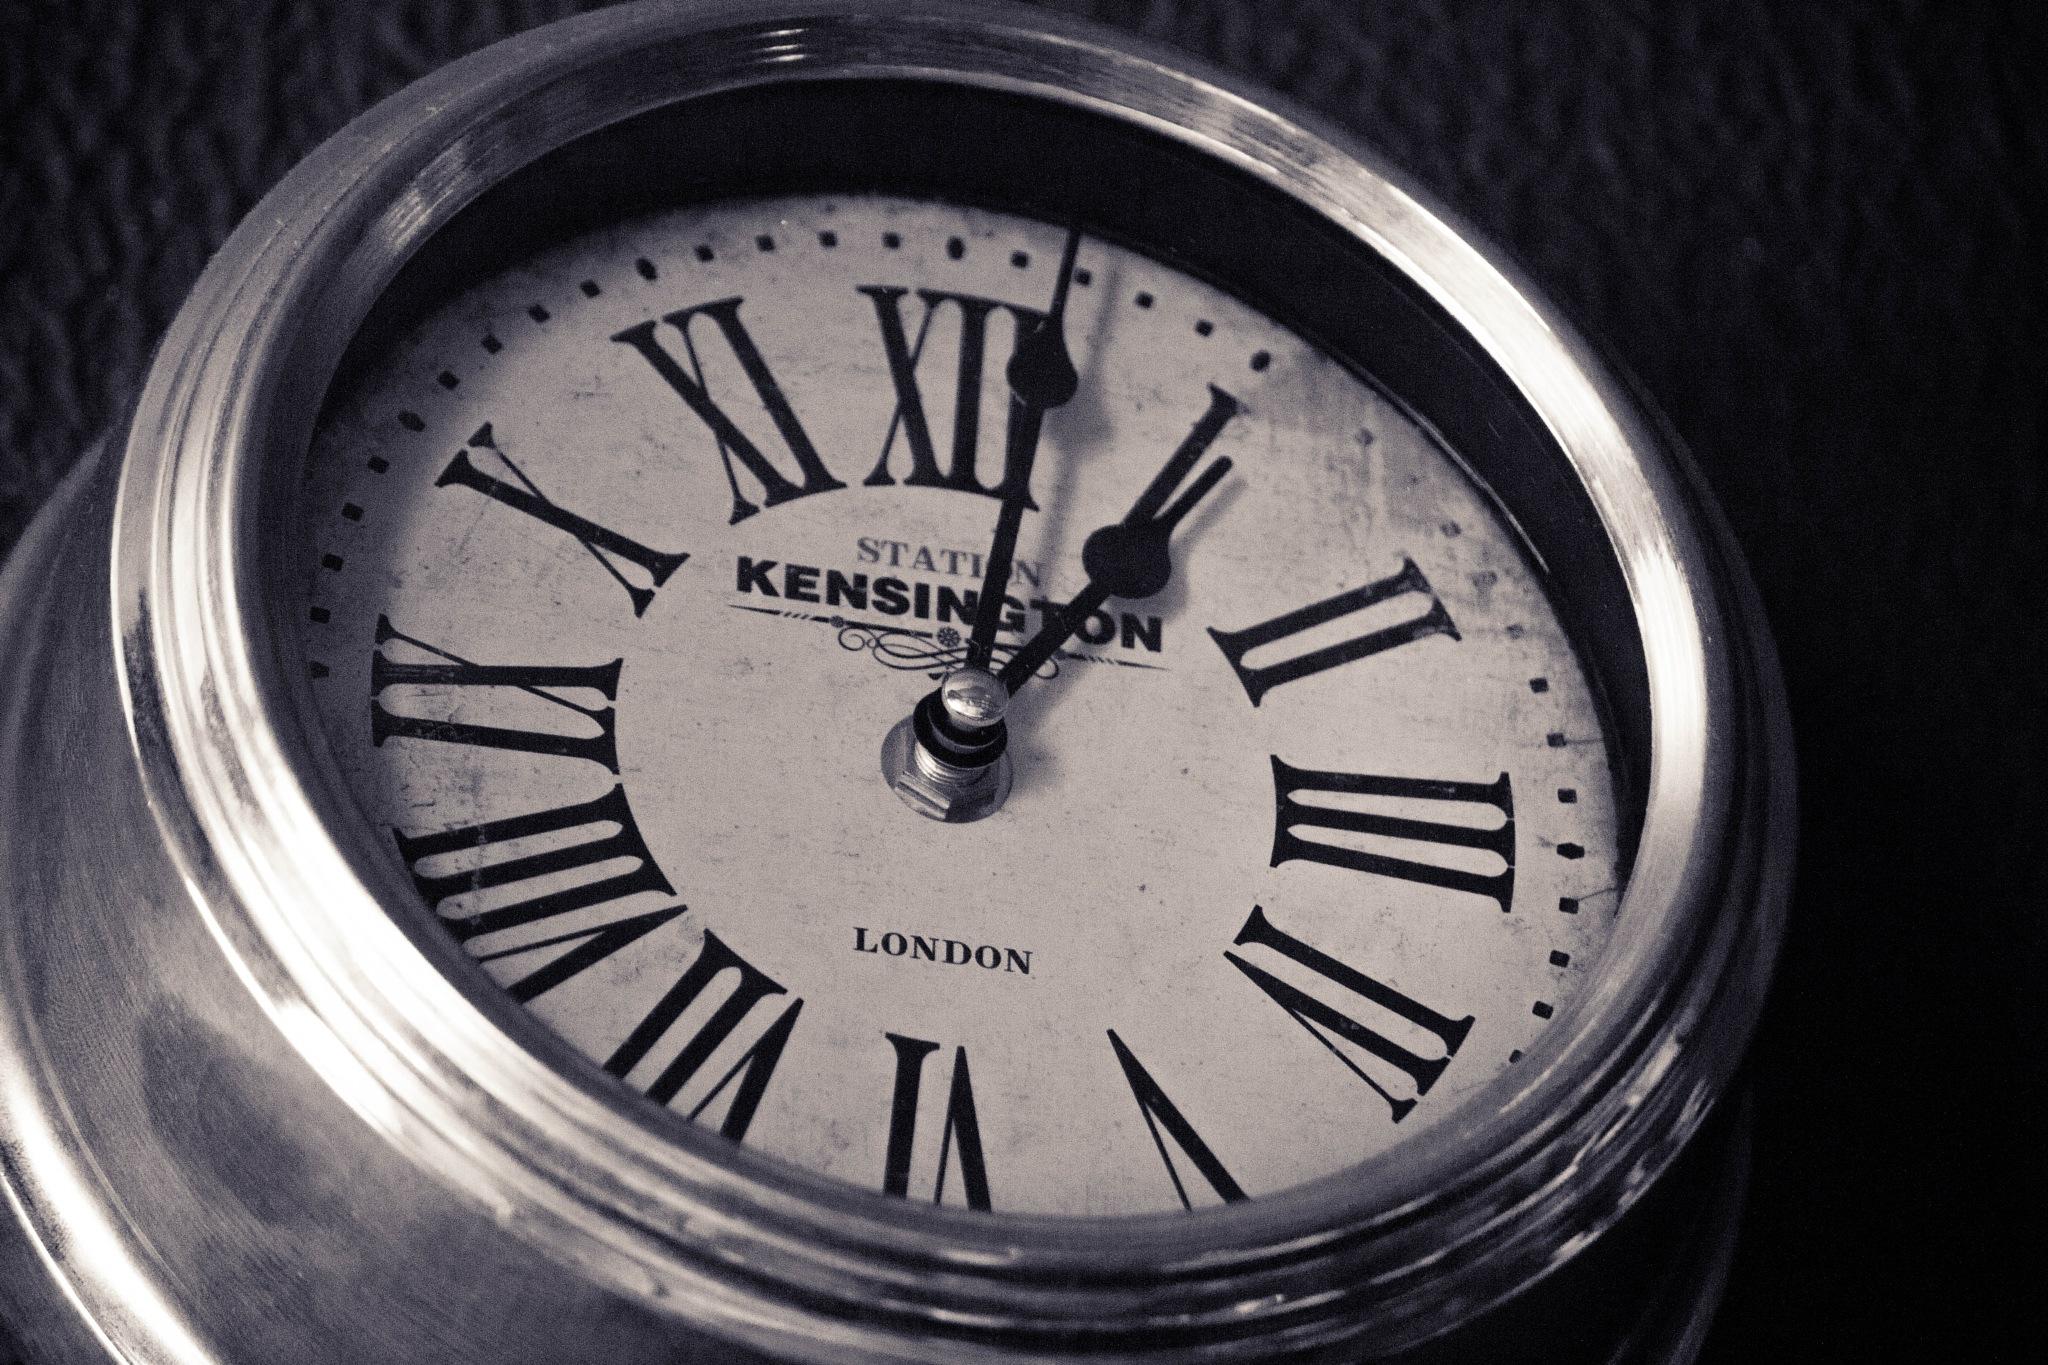 As times goes by by Leonardo Perin Vichi